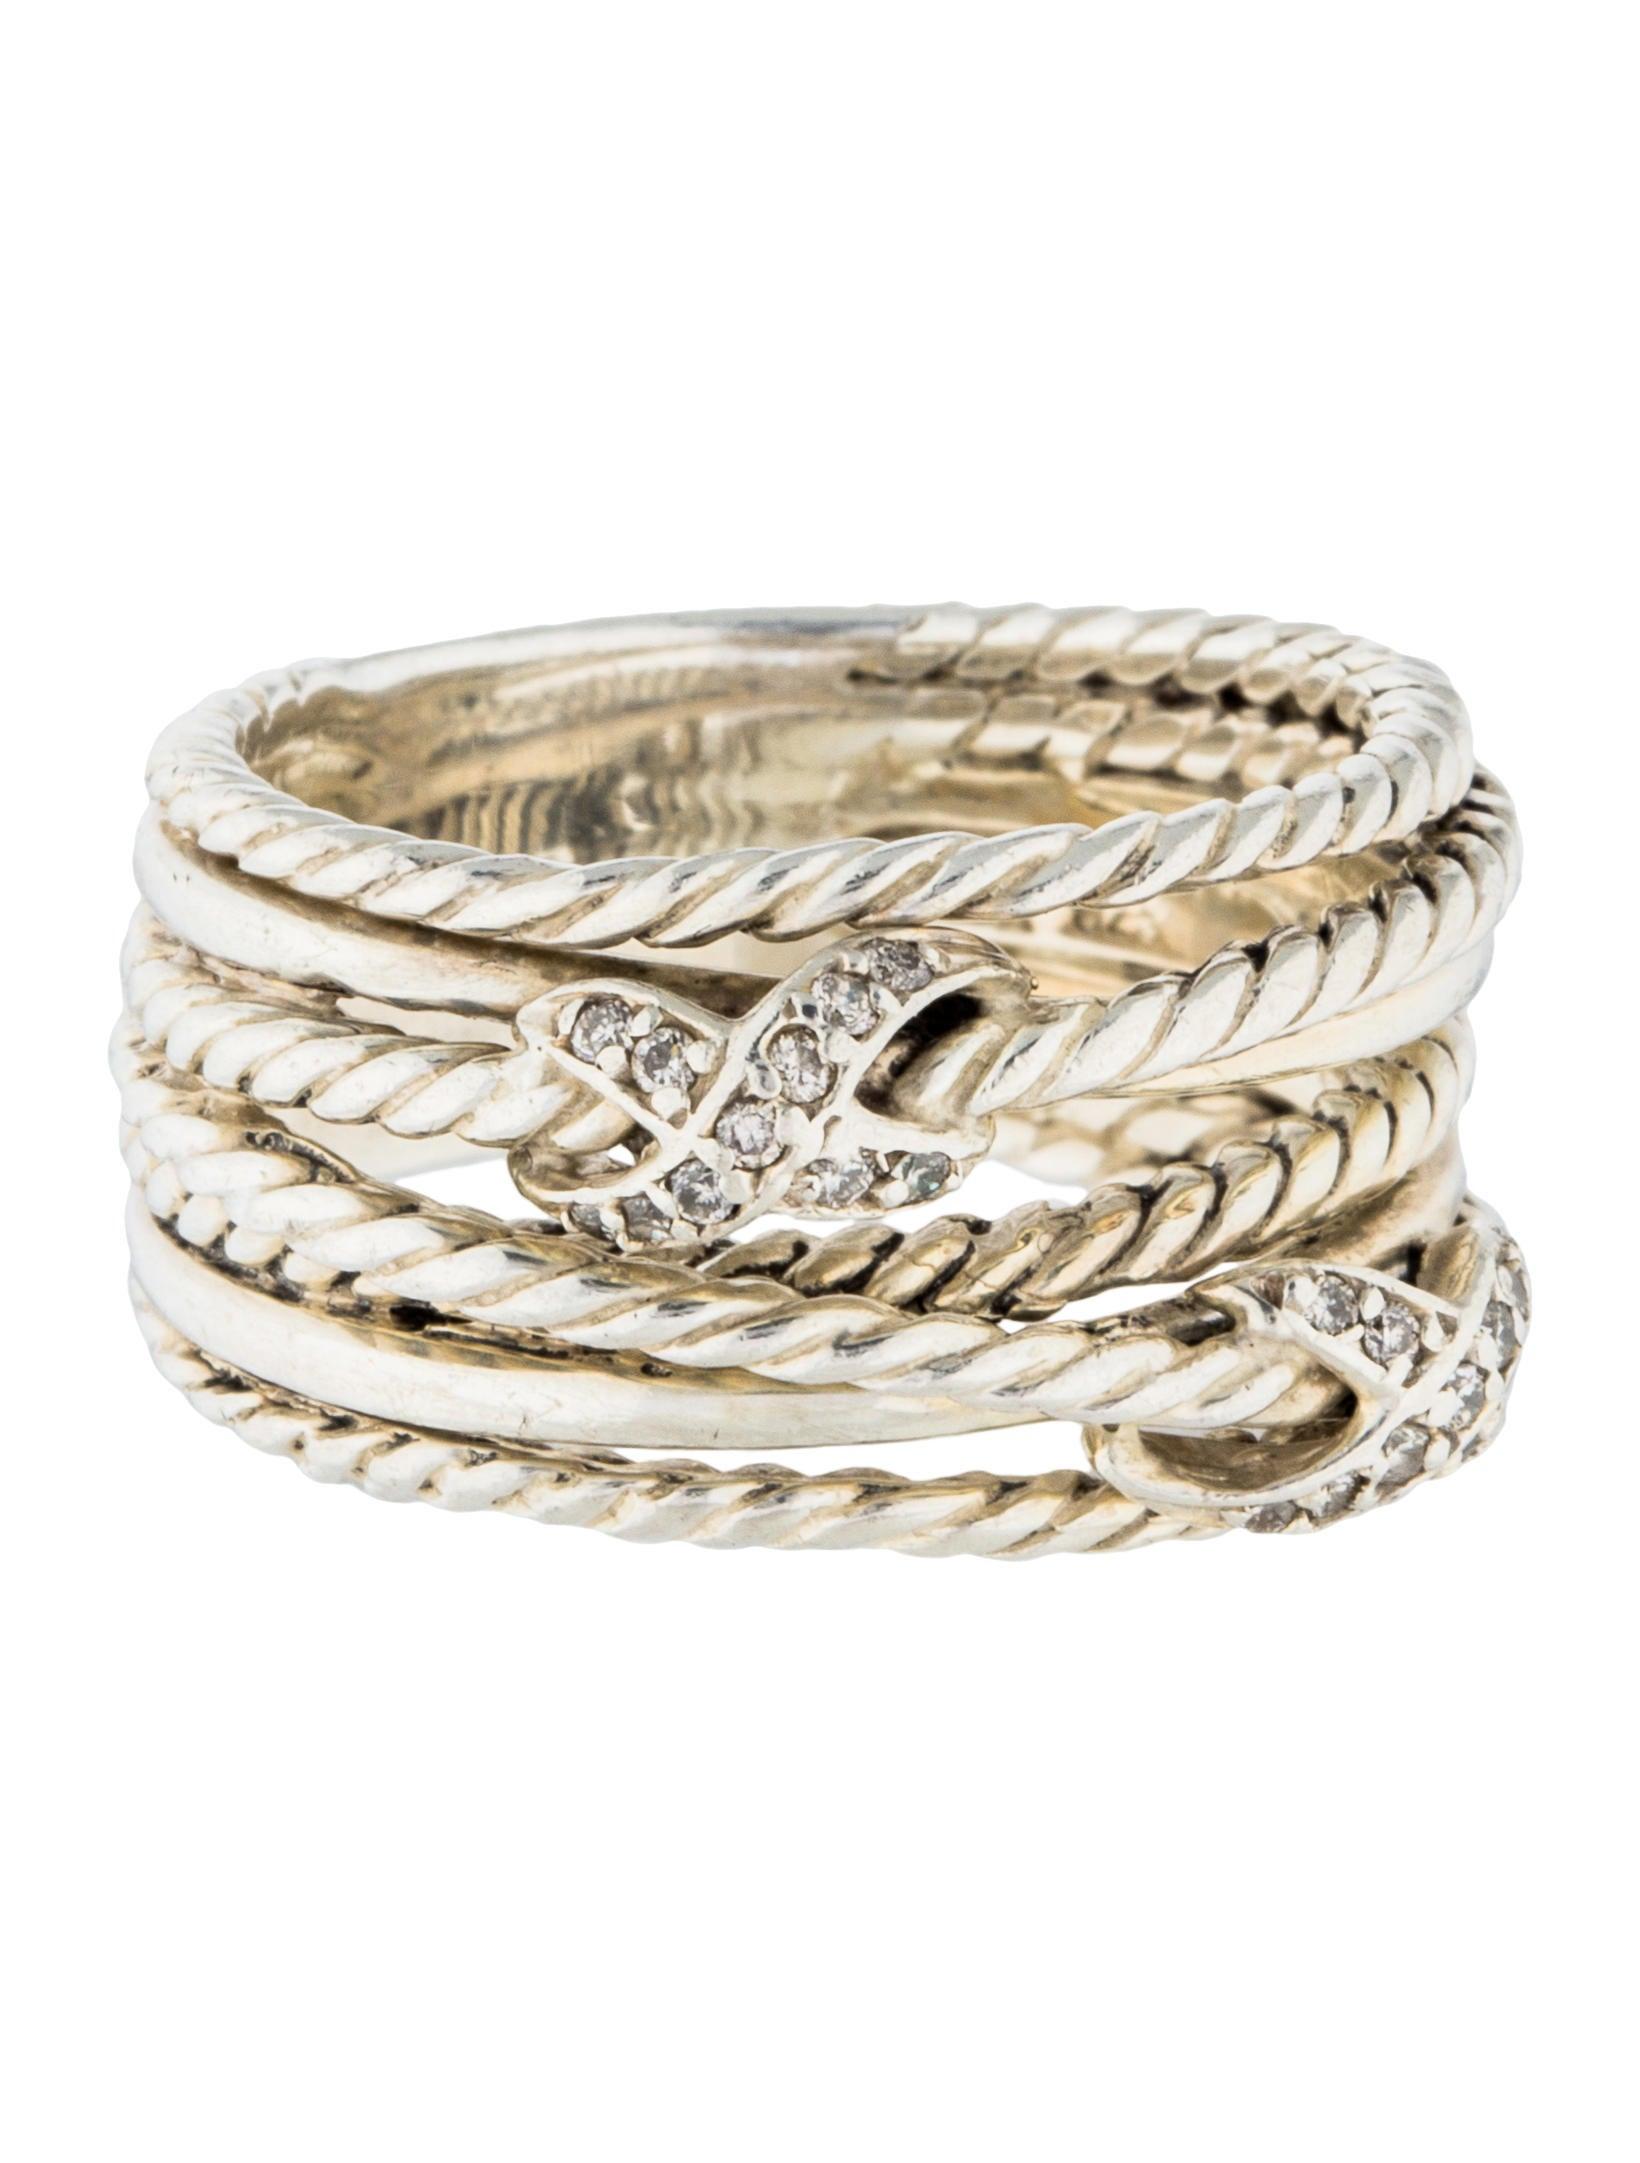 David yurman diamond double x crossover ring rings for David yurman inspired jewelry rings